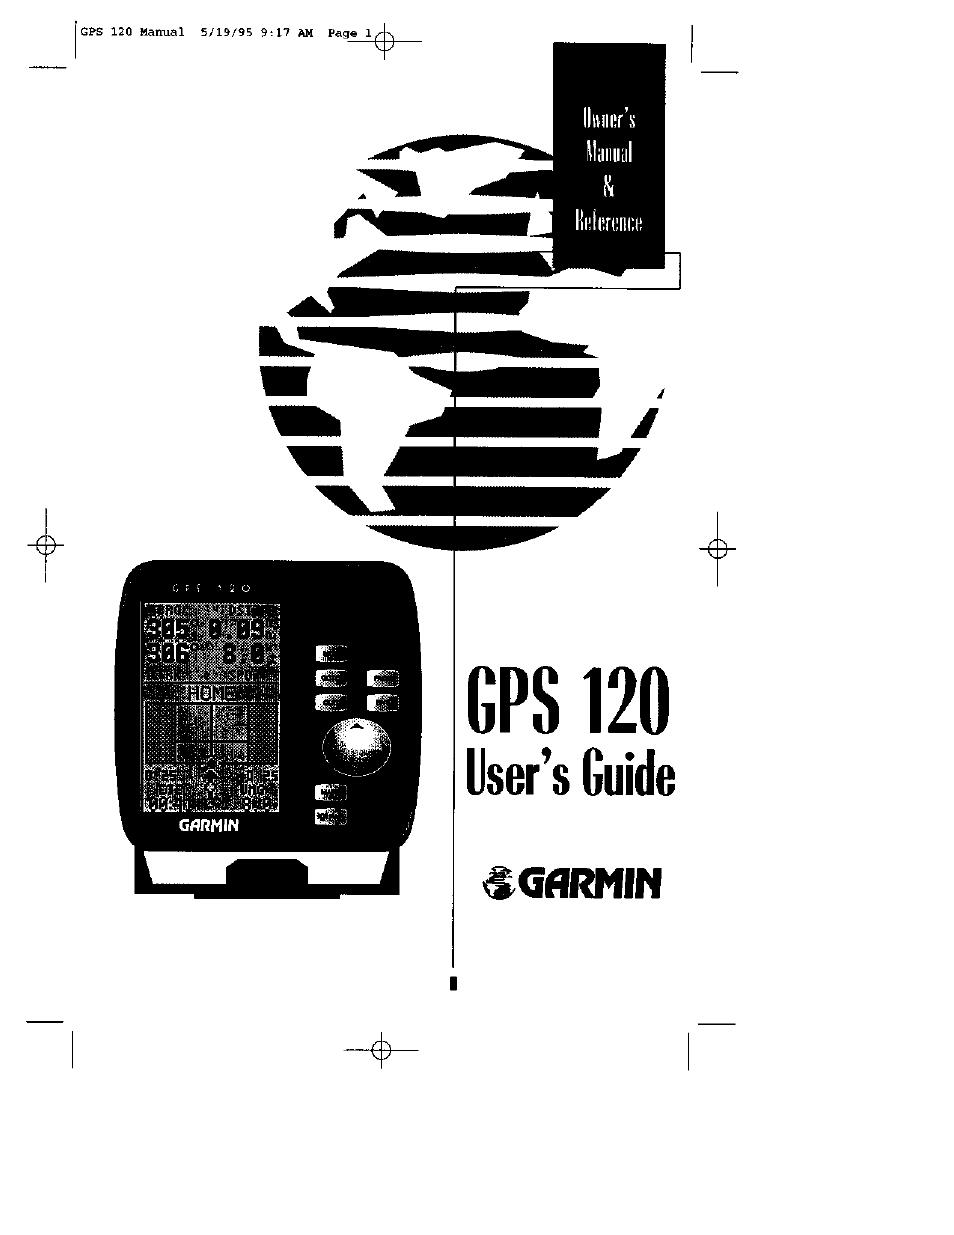 garmin gps 120 user manual 71 pages rh manualsdir com garmin gps 120 manual pdf garmin gps 120 manual pdf